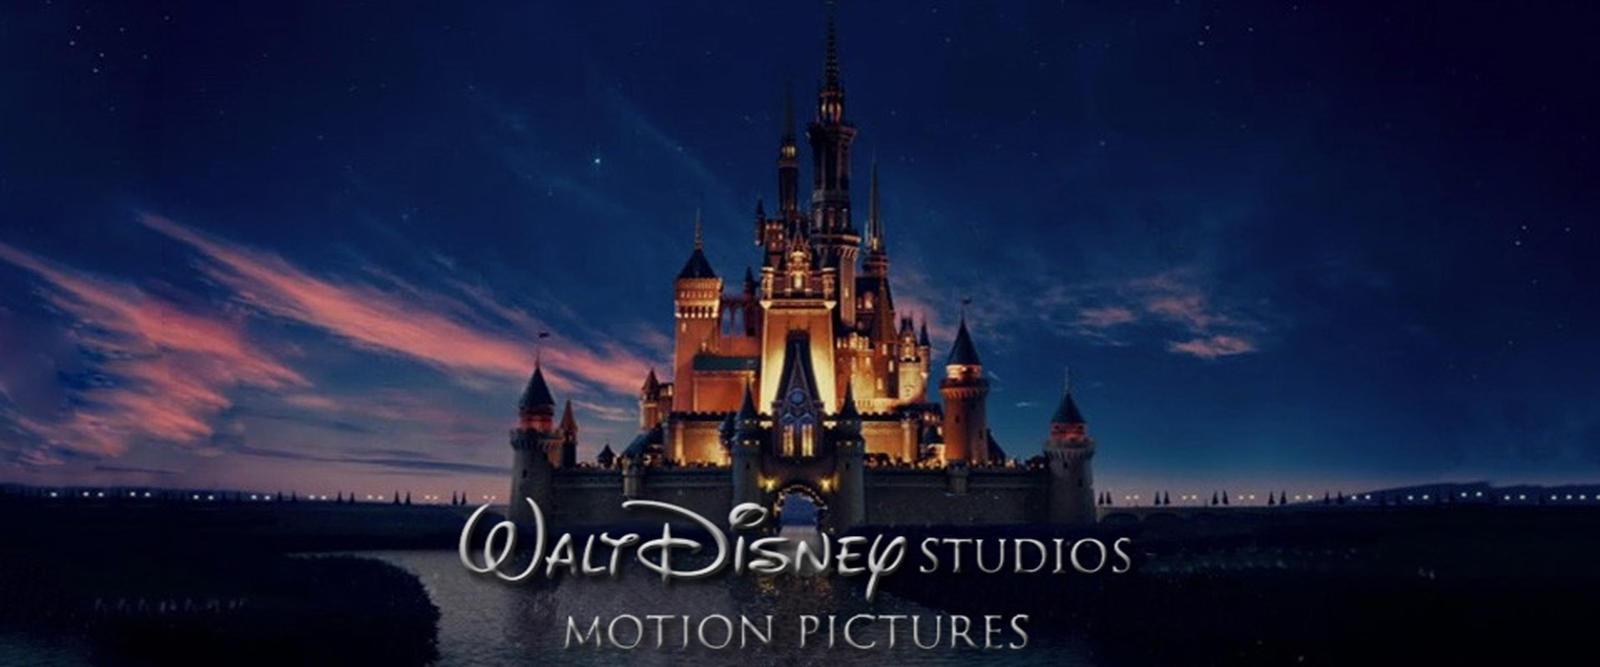 walt disney studios motion pictures on screen logo by